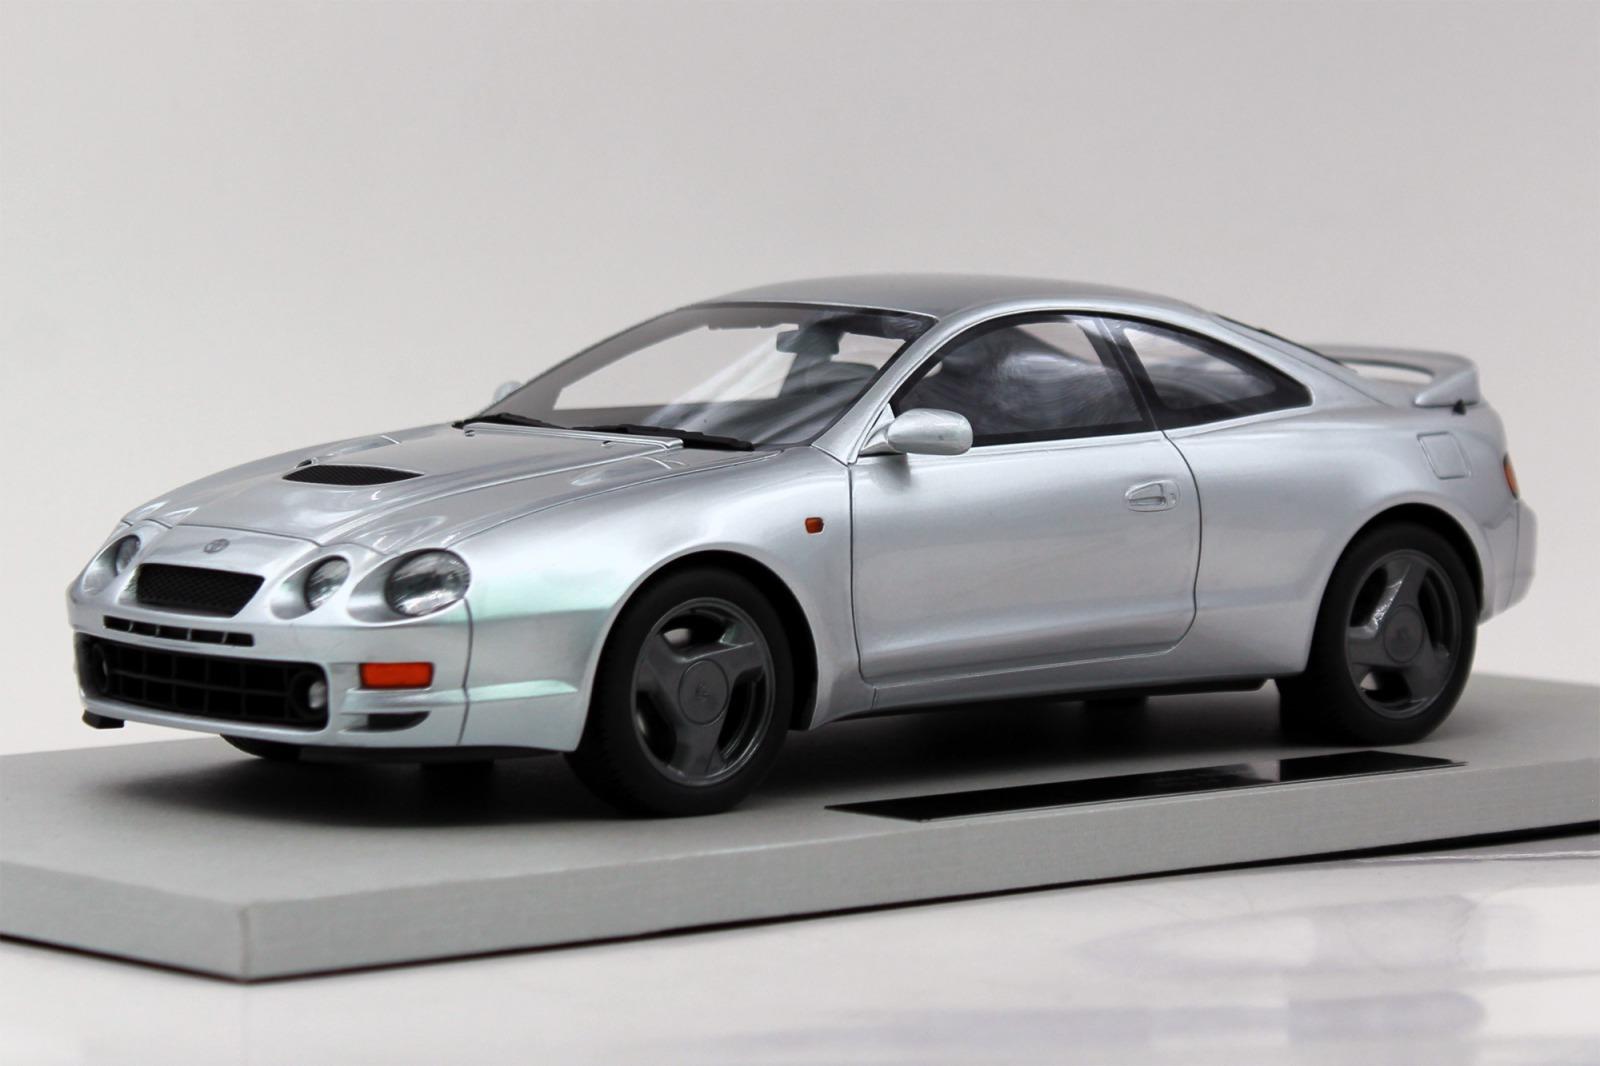 LS Collectibles 1/18 ミニカー レジン プロポーションモデル 1994年モデル トヨタ セリカ GT-Four ST 205 シルバーTOYOTA - CELICA GT-FOUR ST 205 1994 1:18 LS Collectibles